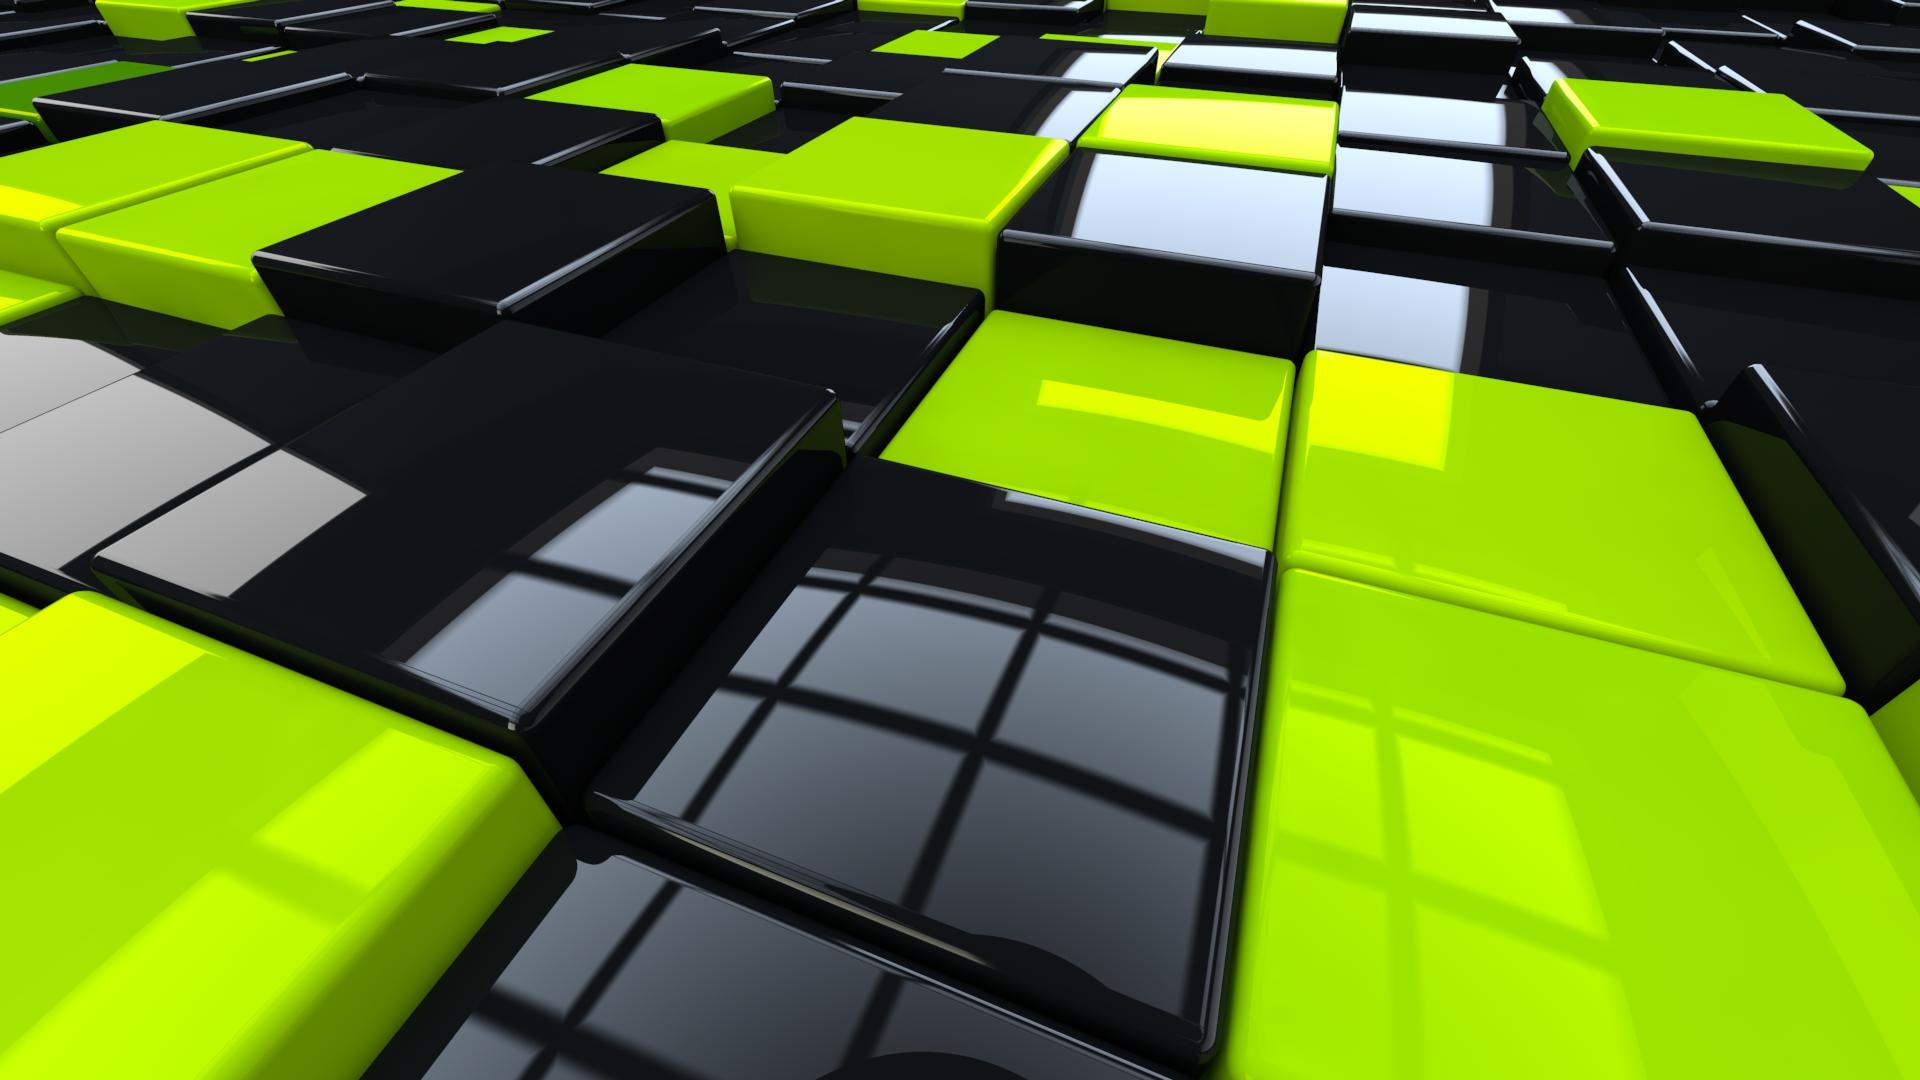 3D Backgrounds Free Smartphone Wallpaper